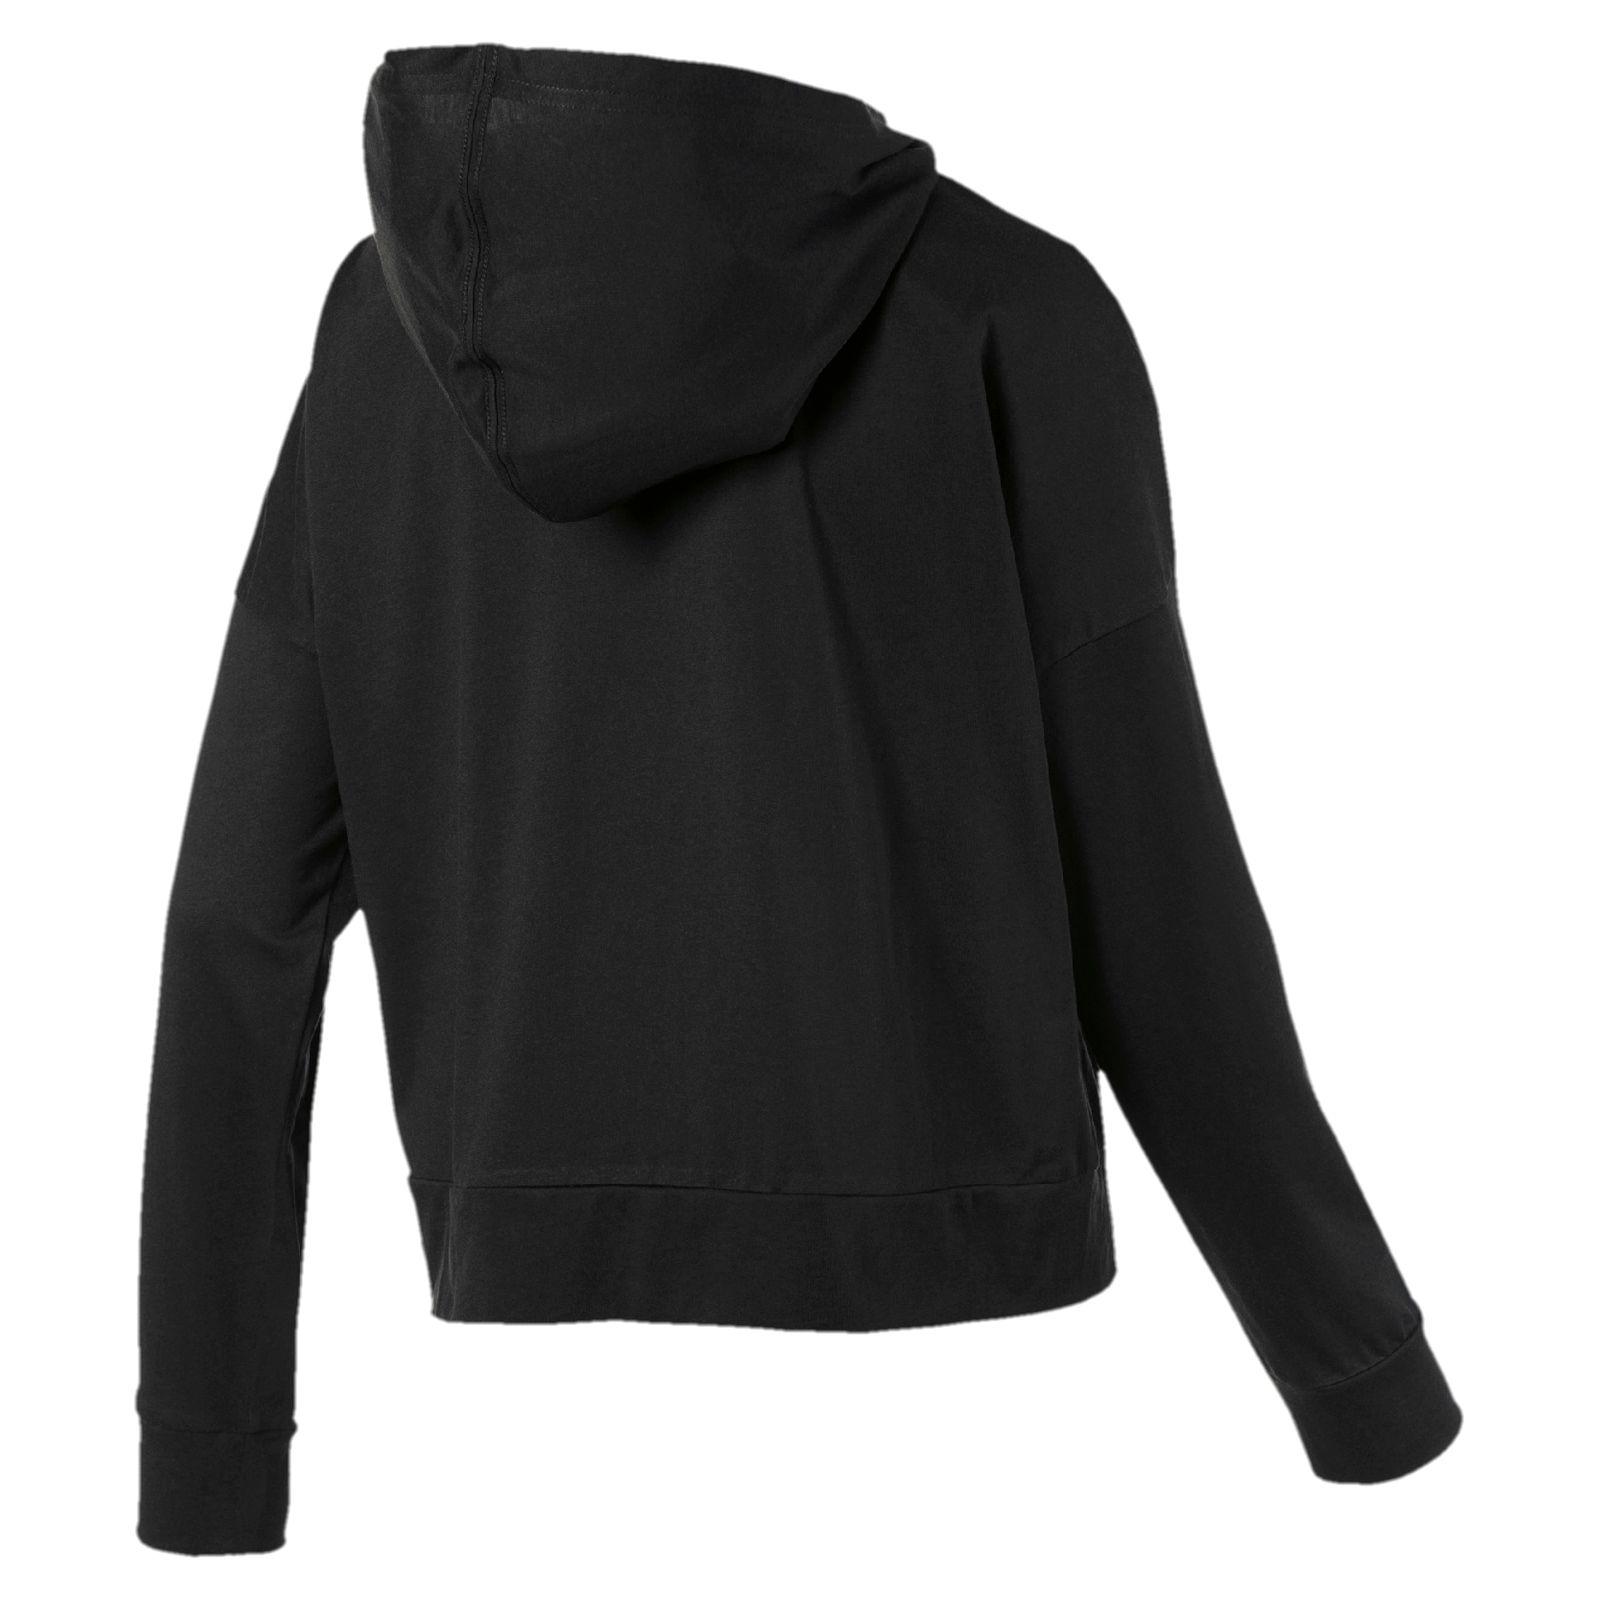 huge discount 1471f e9e8f PUMA MODERN SPORT Cover up Damen T-Shirt Schwarz